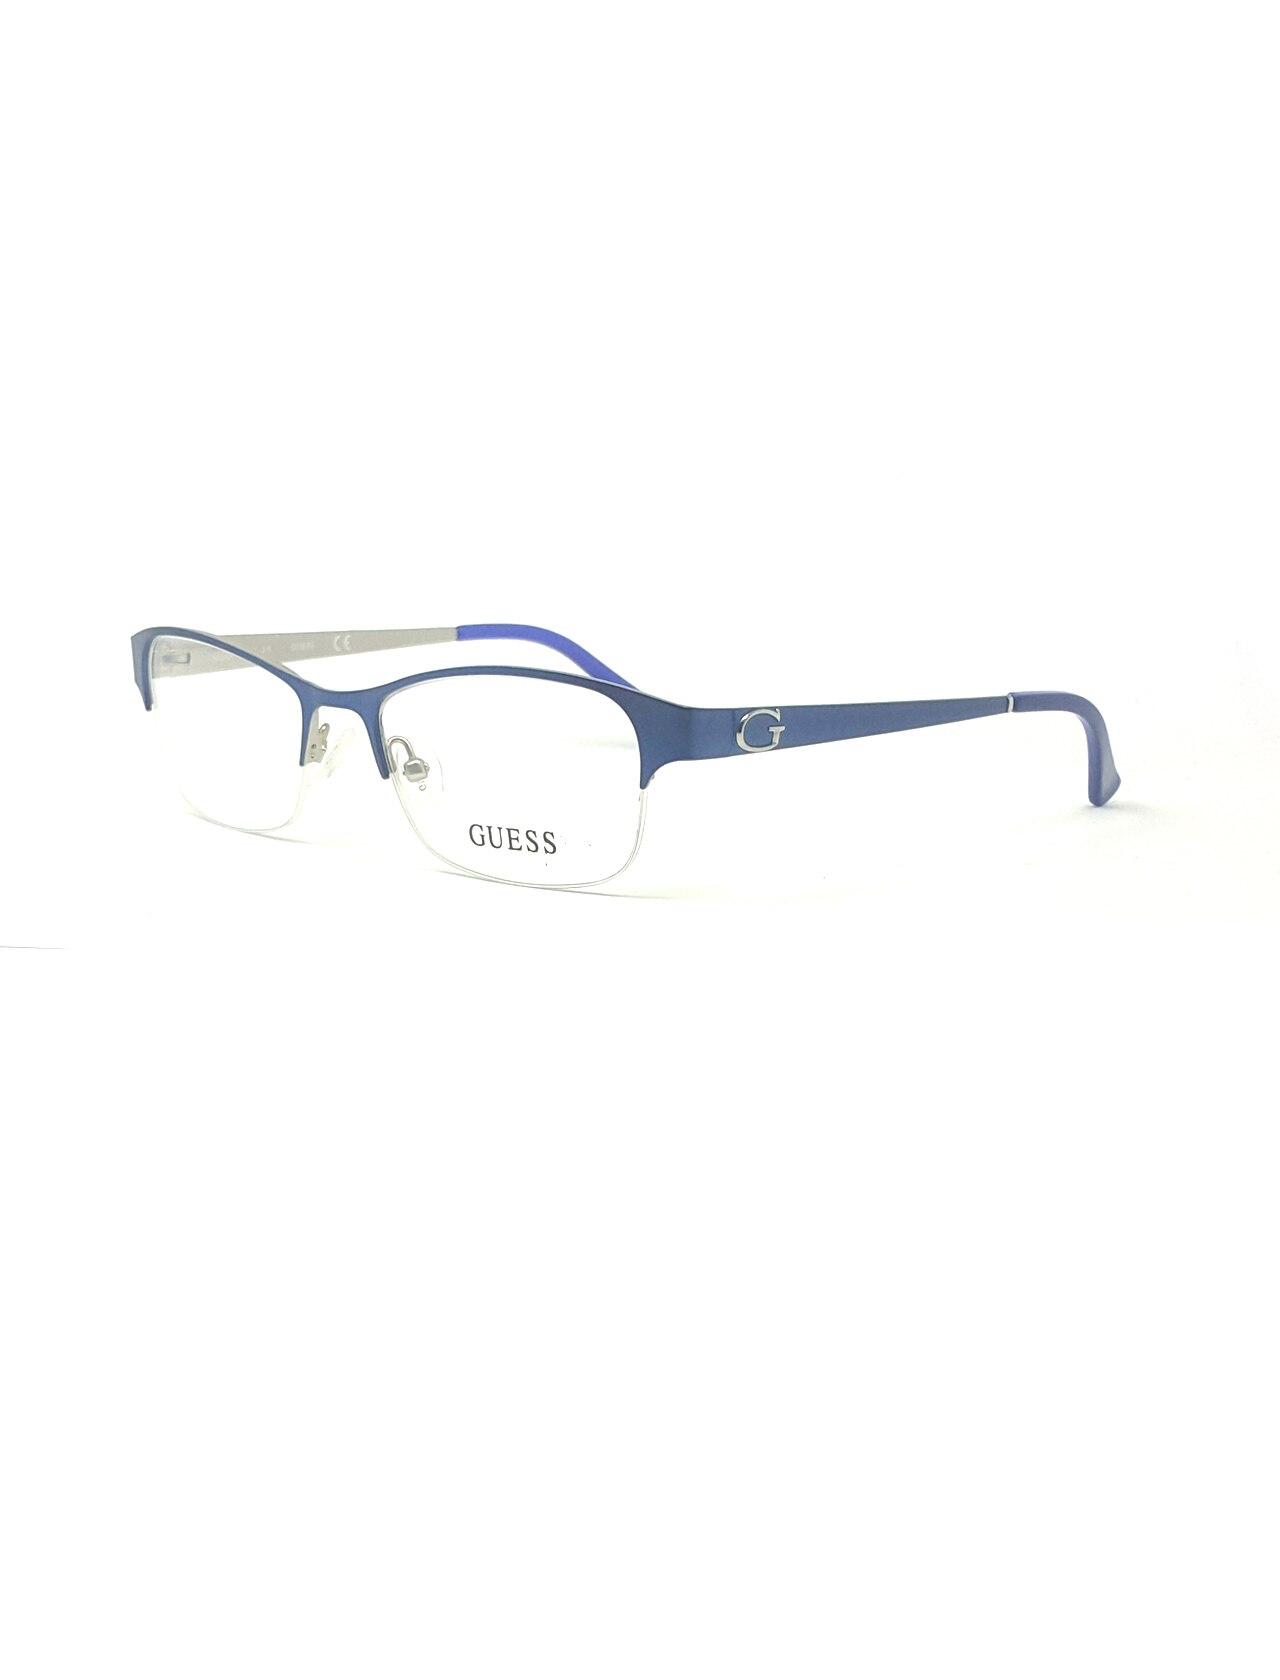 Women's Image Sunglasses Gu 2567 092 Metal Optical Demo Glass 51-guess